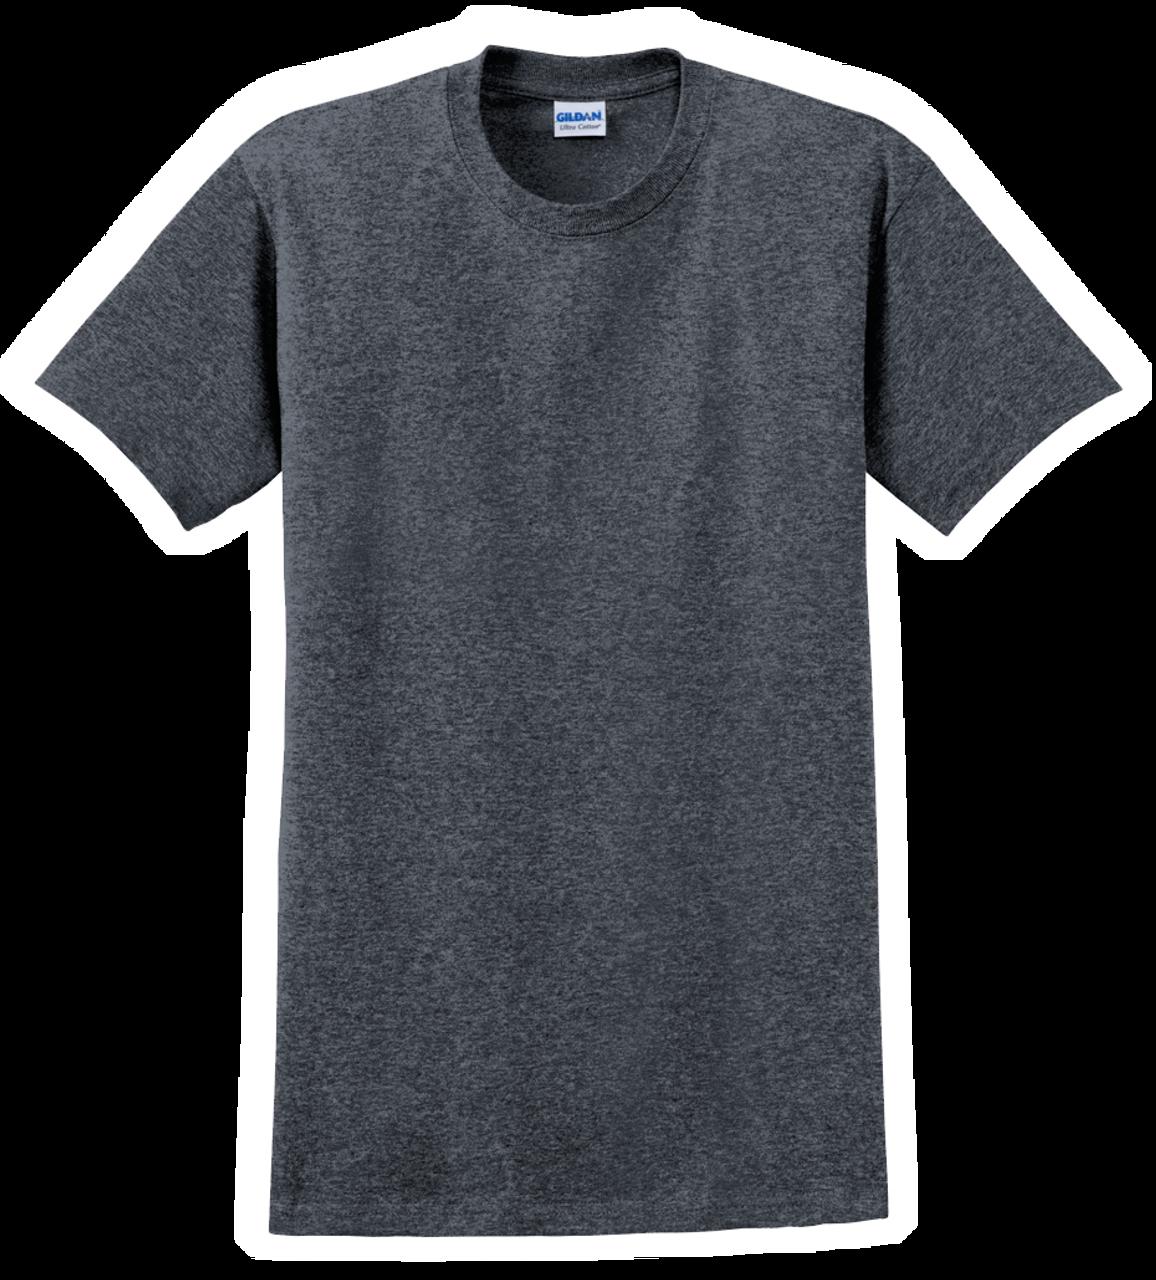 G2000 Dark Heather T-Shirt Short Sleeve by Gildan